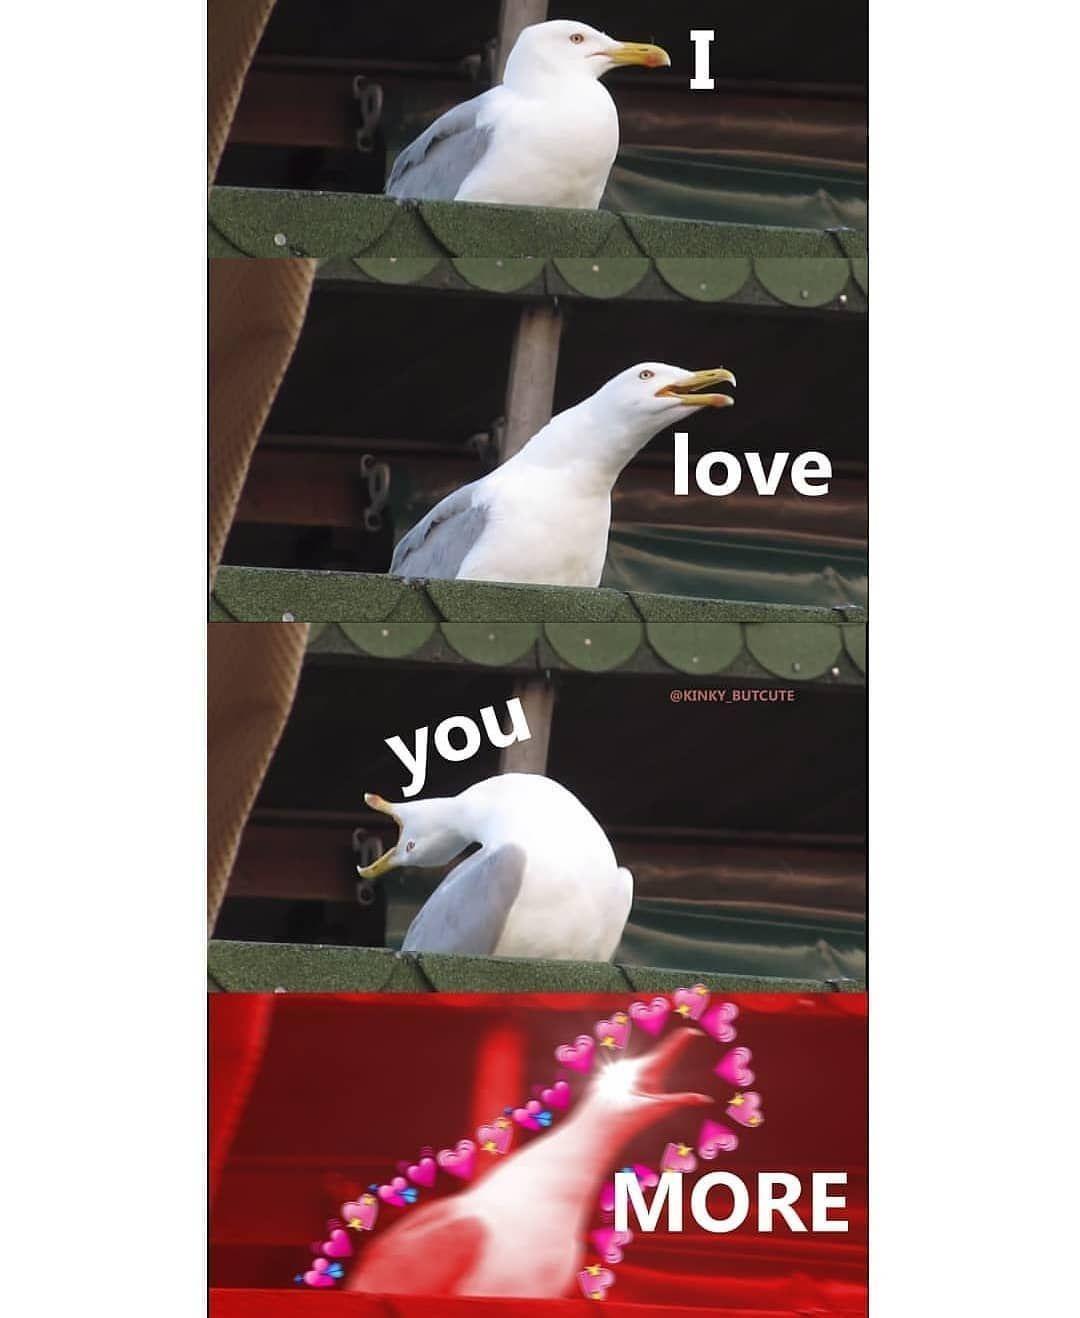 Grayson On Instagram That S It I Love You More I Love You Memes Otuziki Blog Cute Love Memes Love You Meme Cute Memes